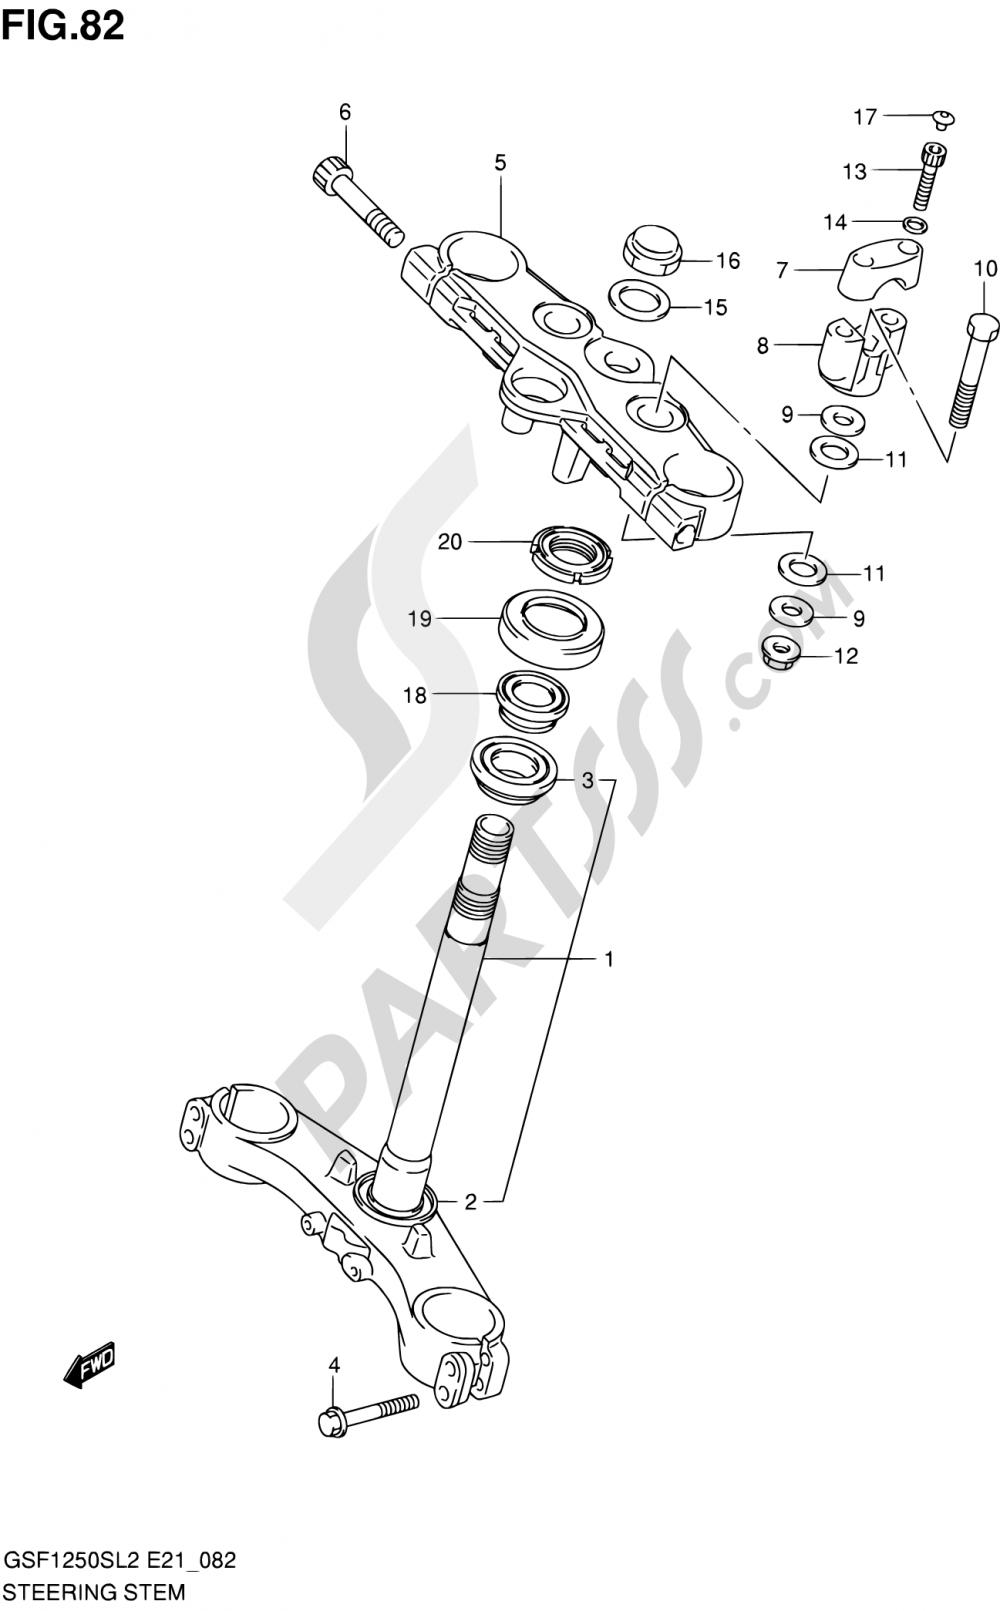 82 - STEERING STEM Suzuki BANDIT GSF1250SA 2012